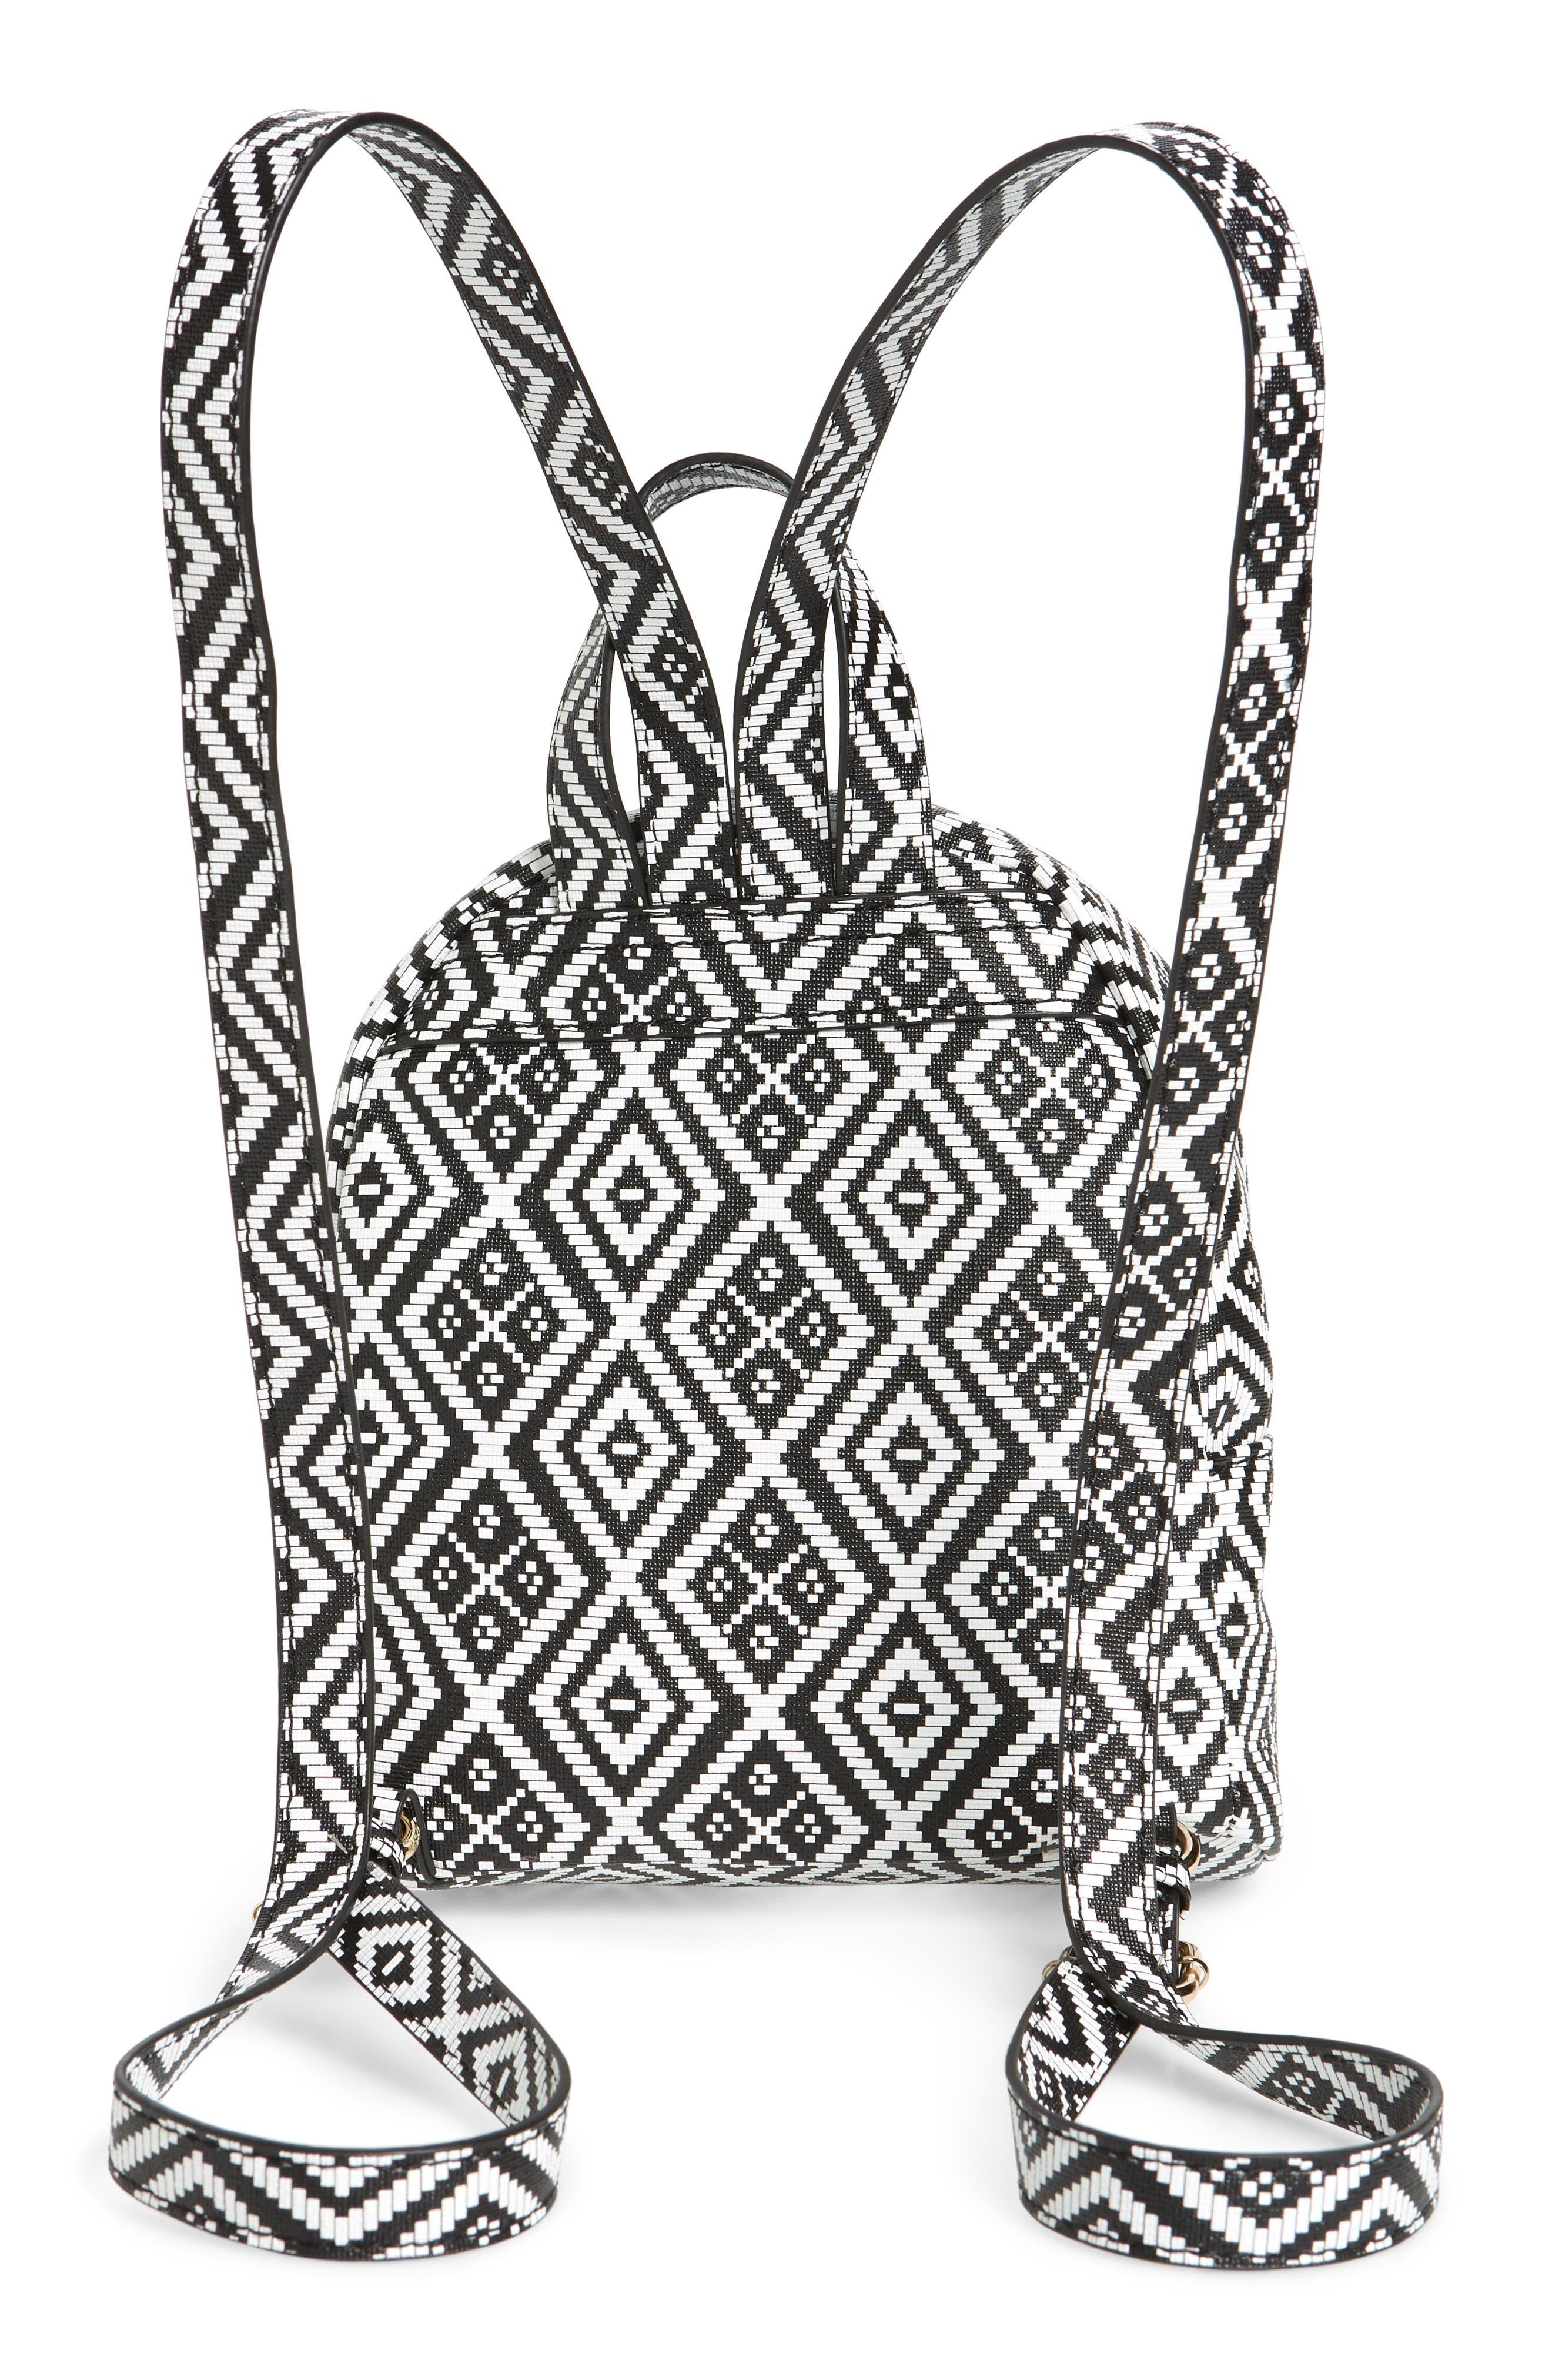 Weave Pattern Faux Leather Mini Backpack,                             Alternate thumbnail 3, color,                             Black/ White